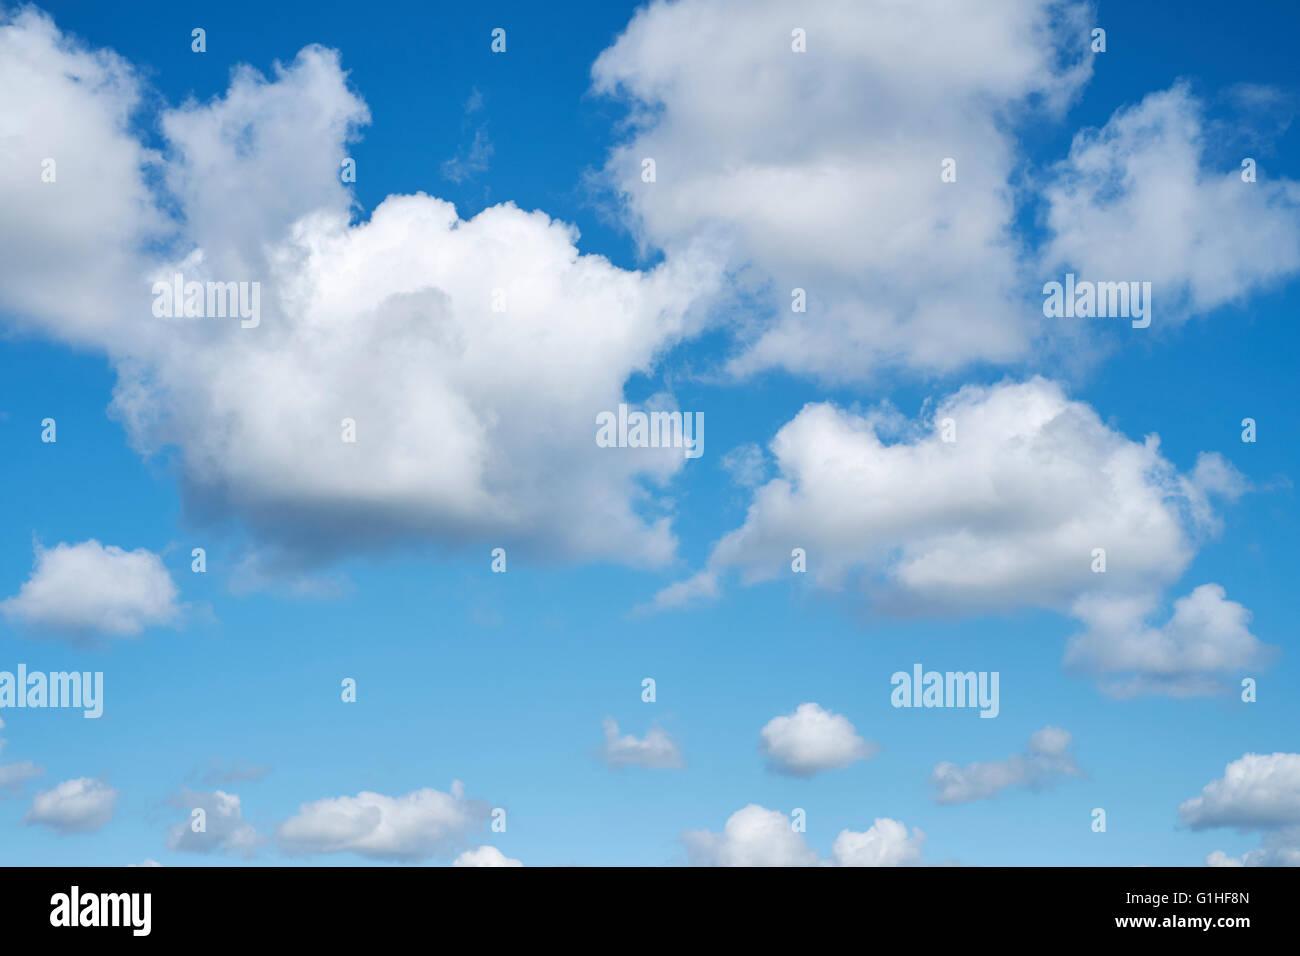 Cumulonimbus cloud formations against a bright blue sky. Cambridgeshire. UK. - Stock Image